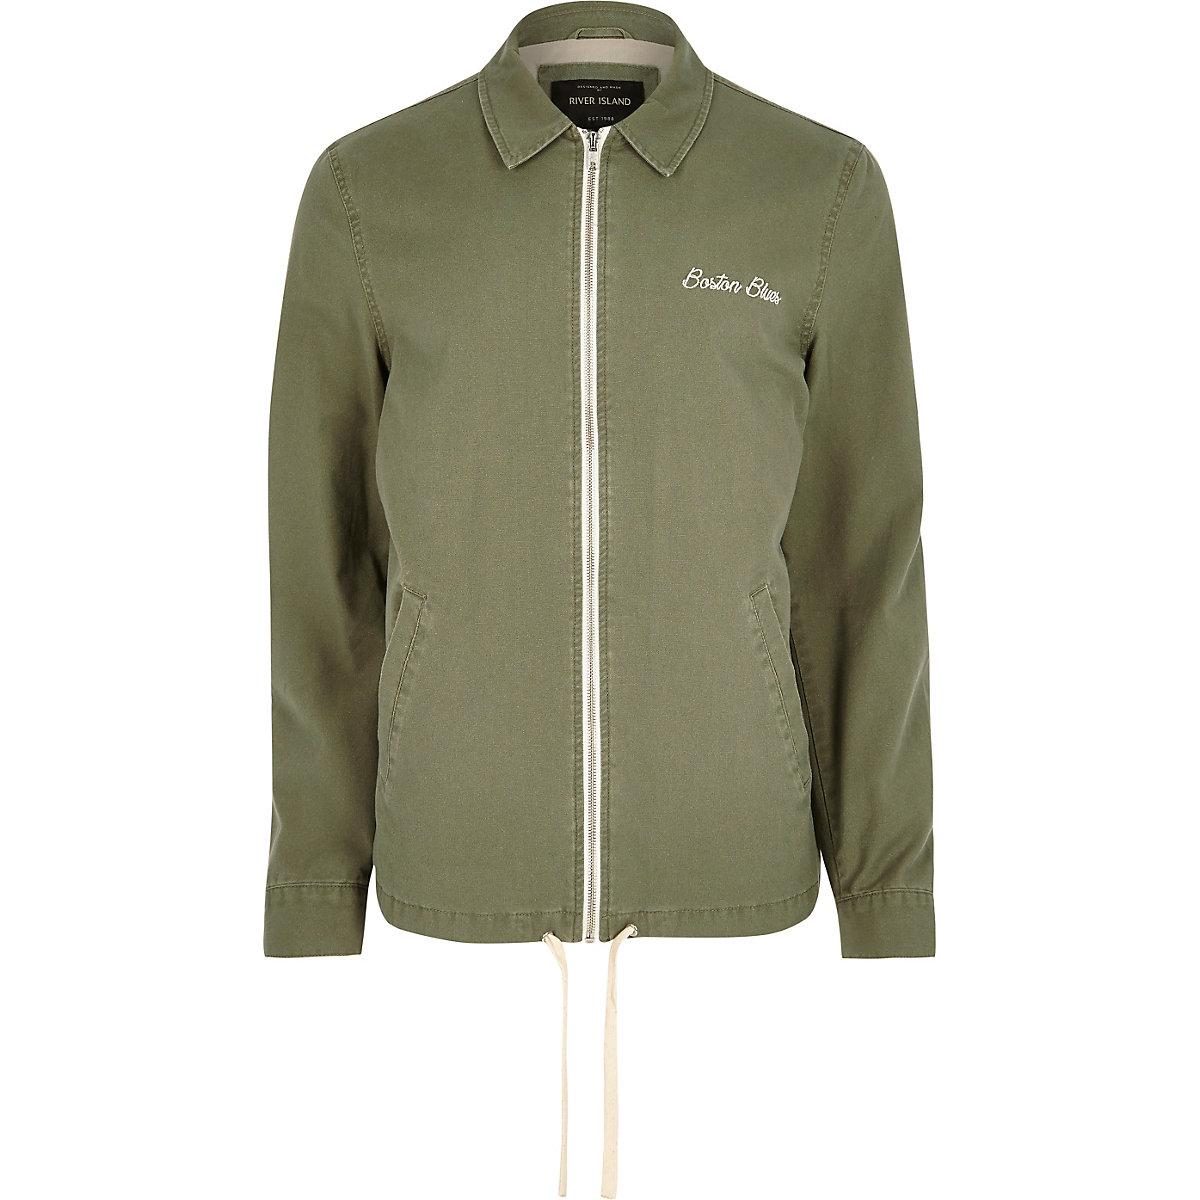 Green Boston embroidered Harrington jacket